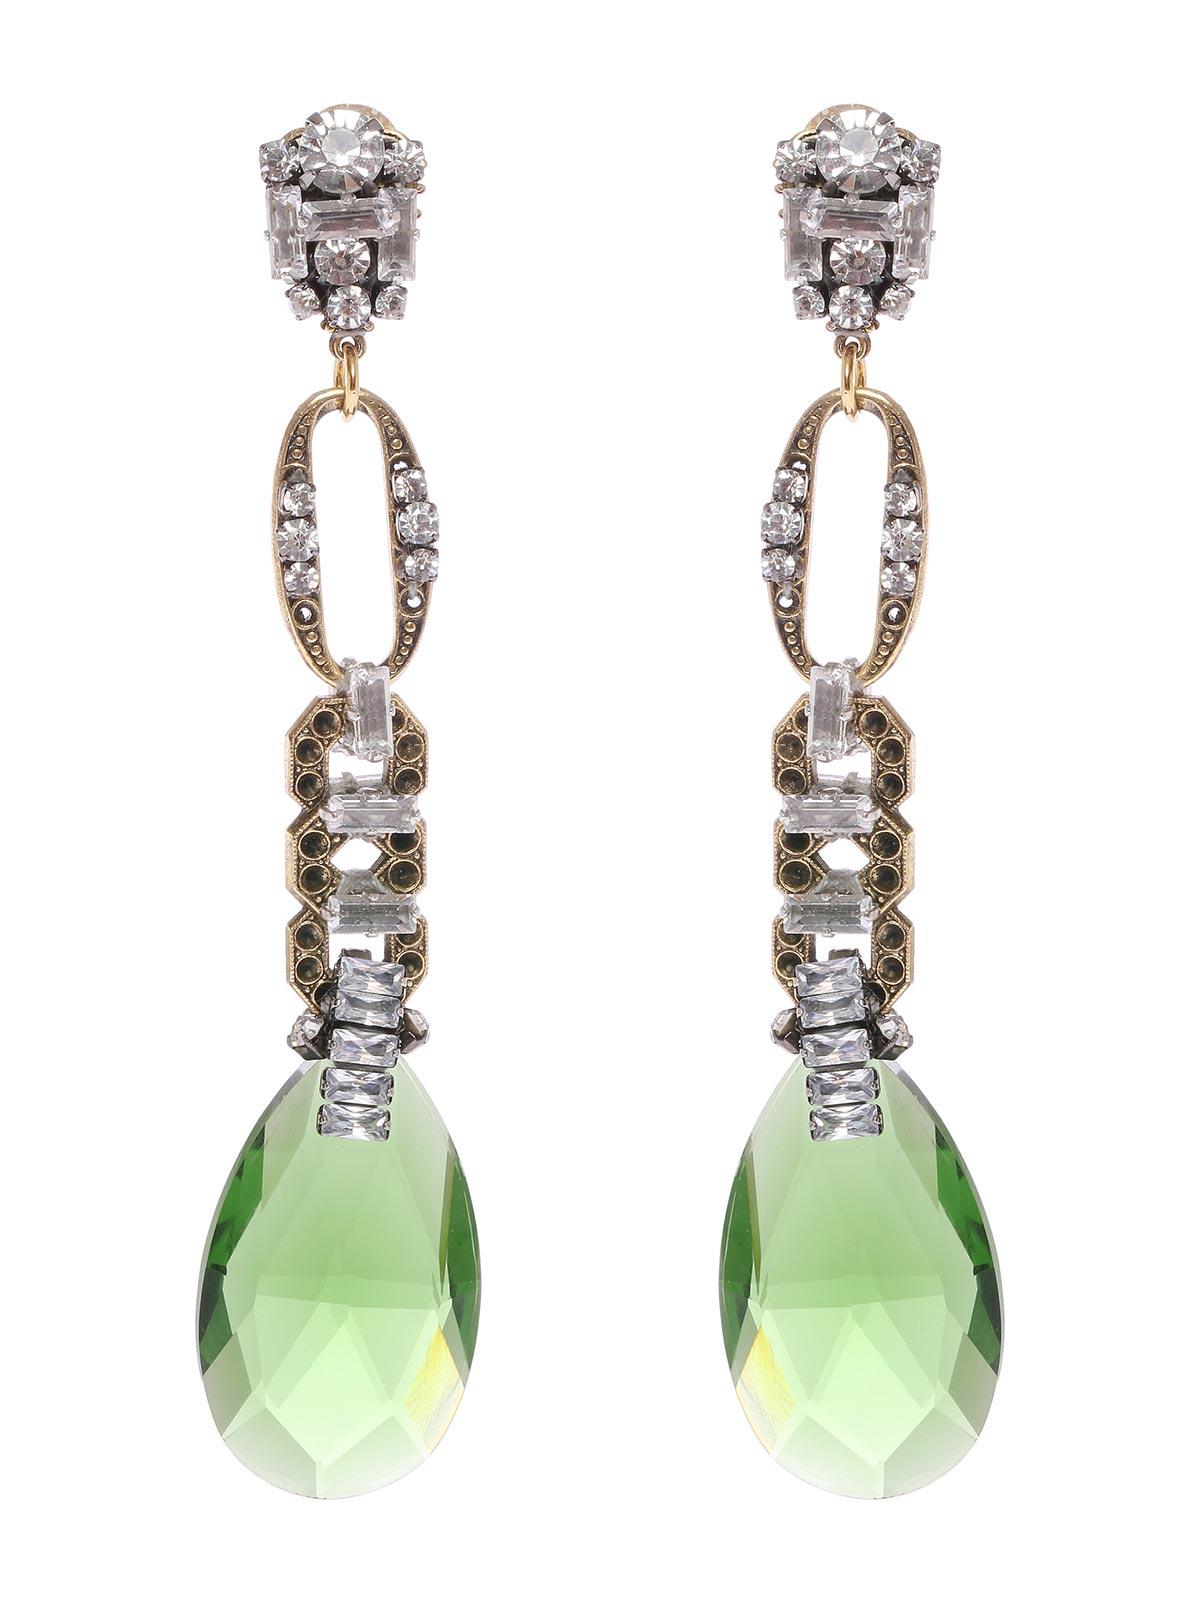 Crystal earrings with drop pendant